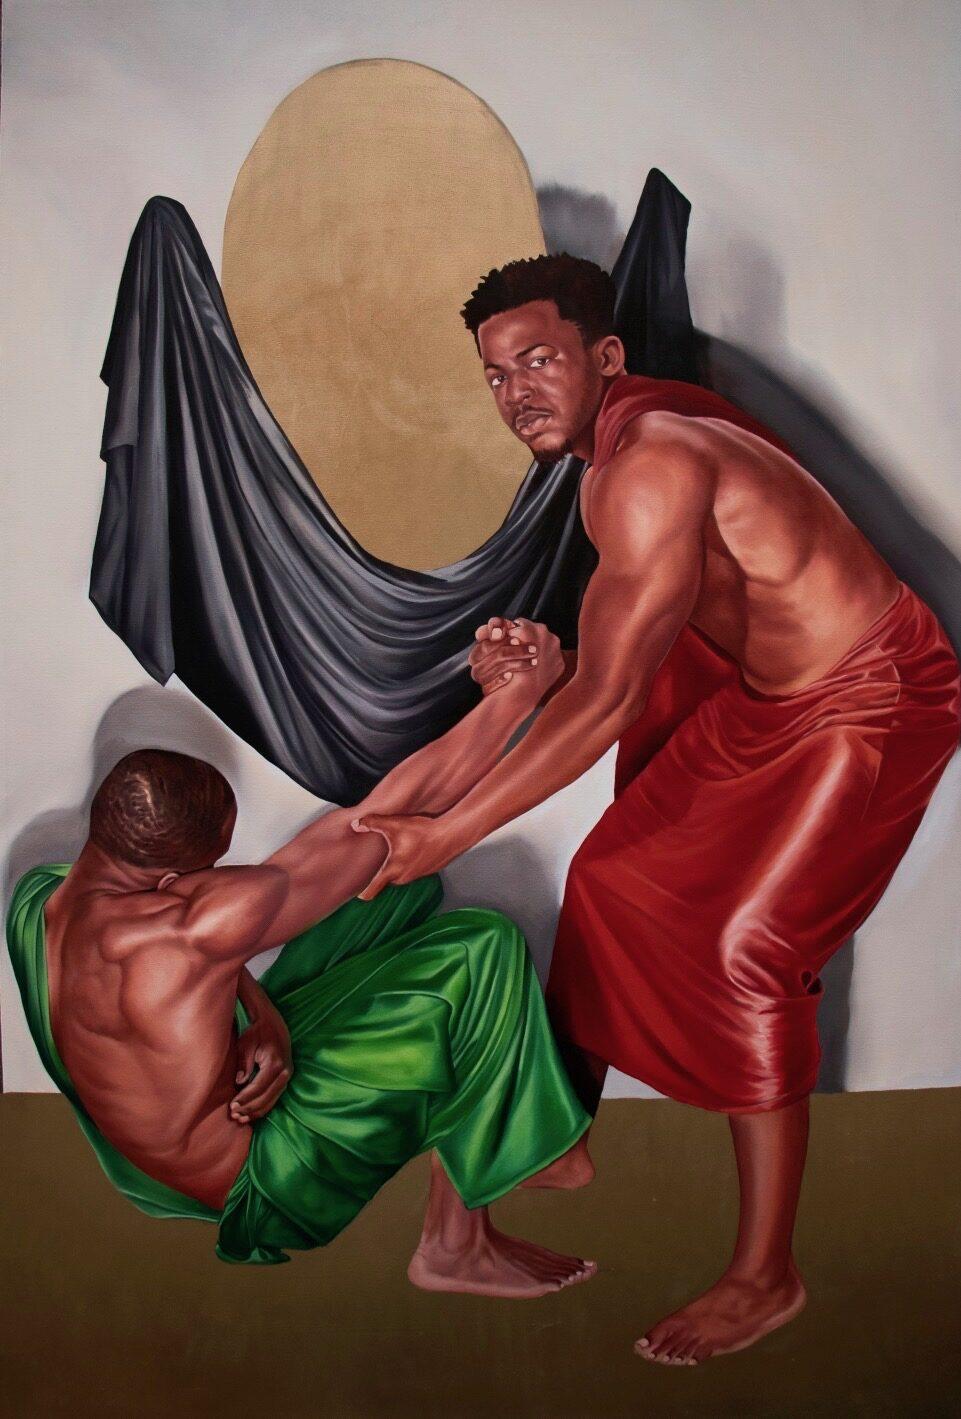 """Strengthen the Brethren"" by Tyler Ballon, oil on canvas, 90 x 60 inches"